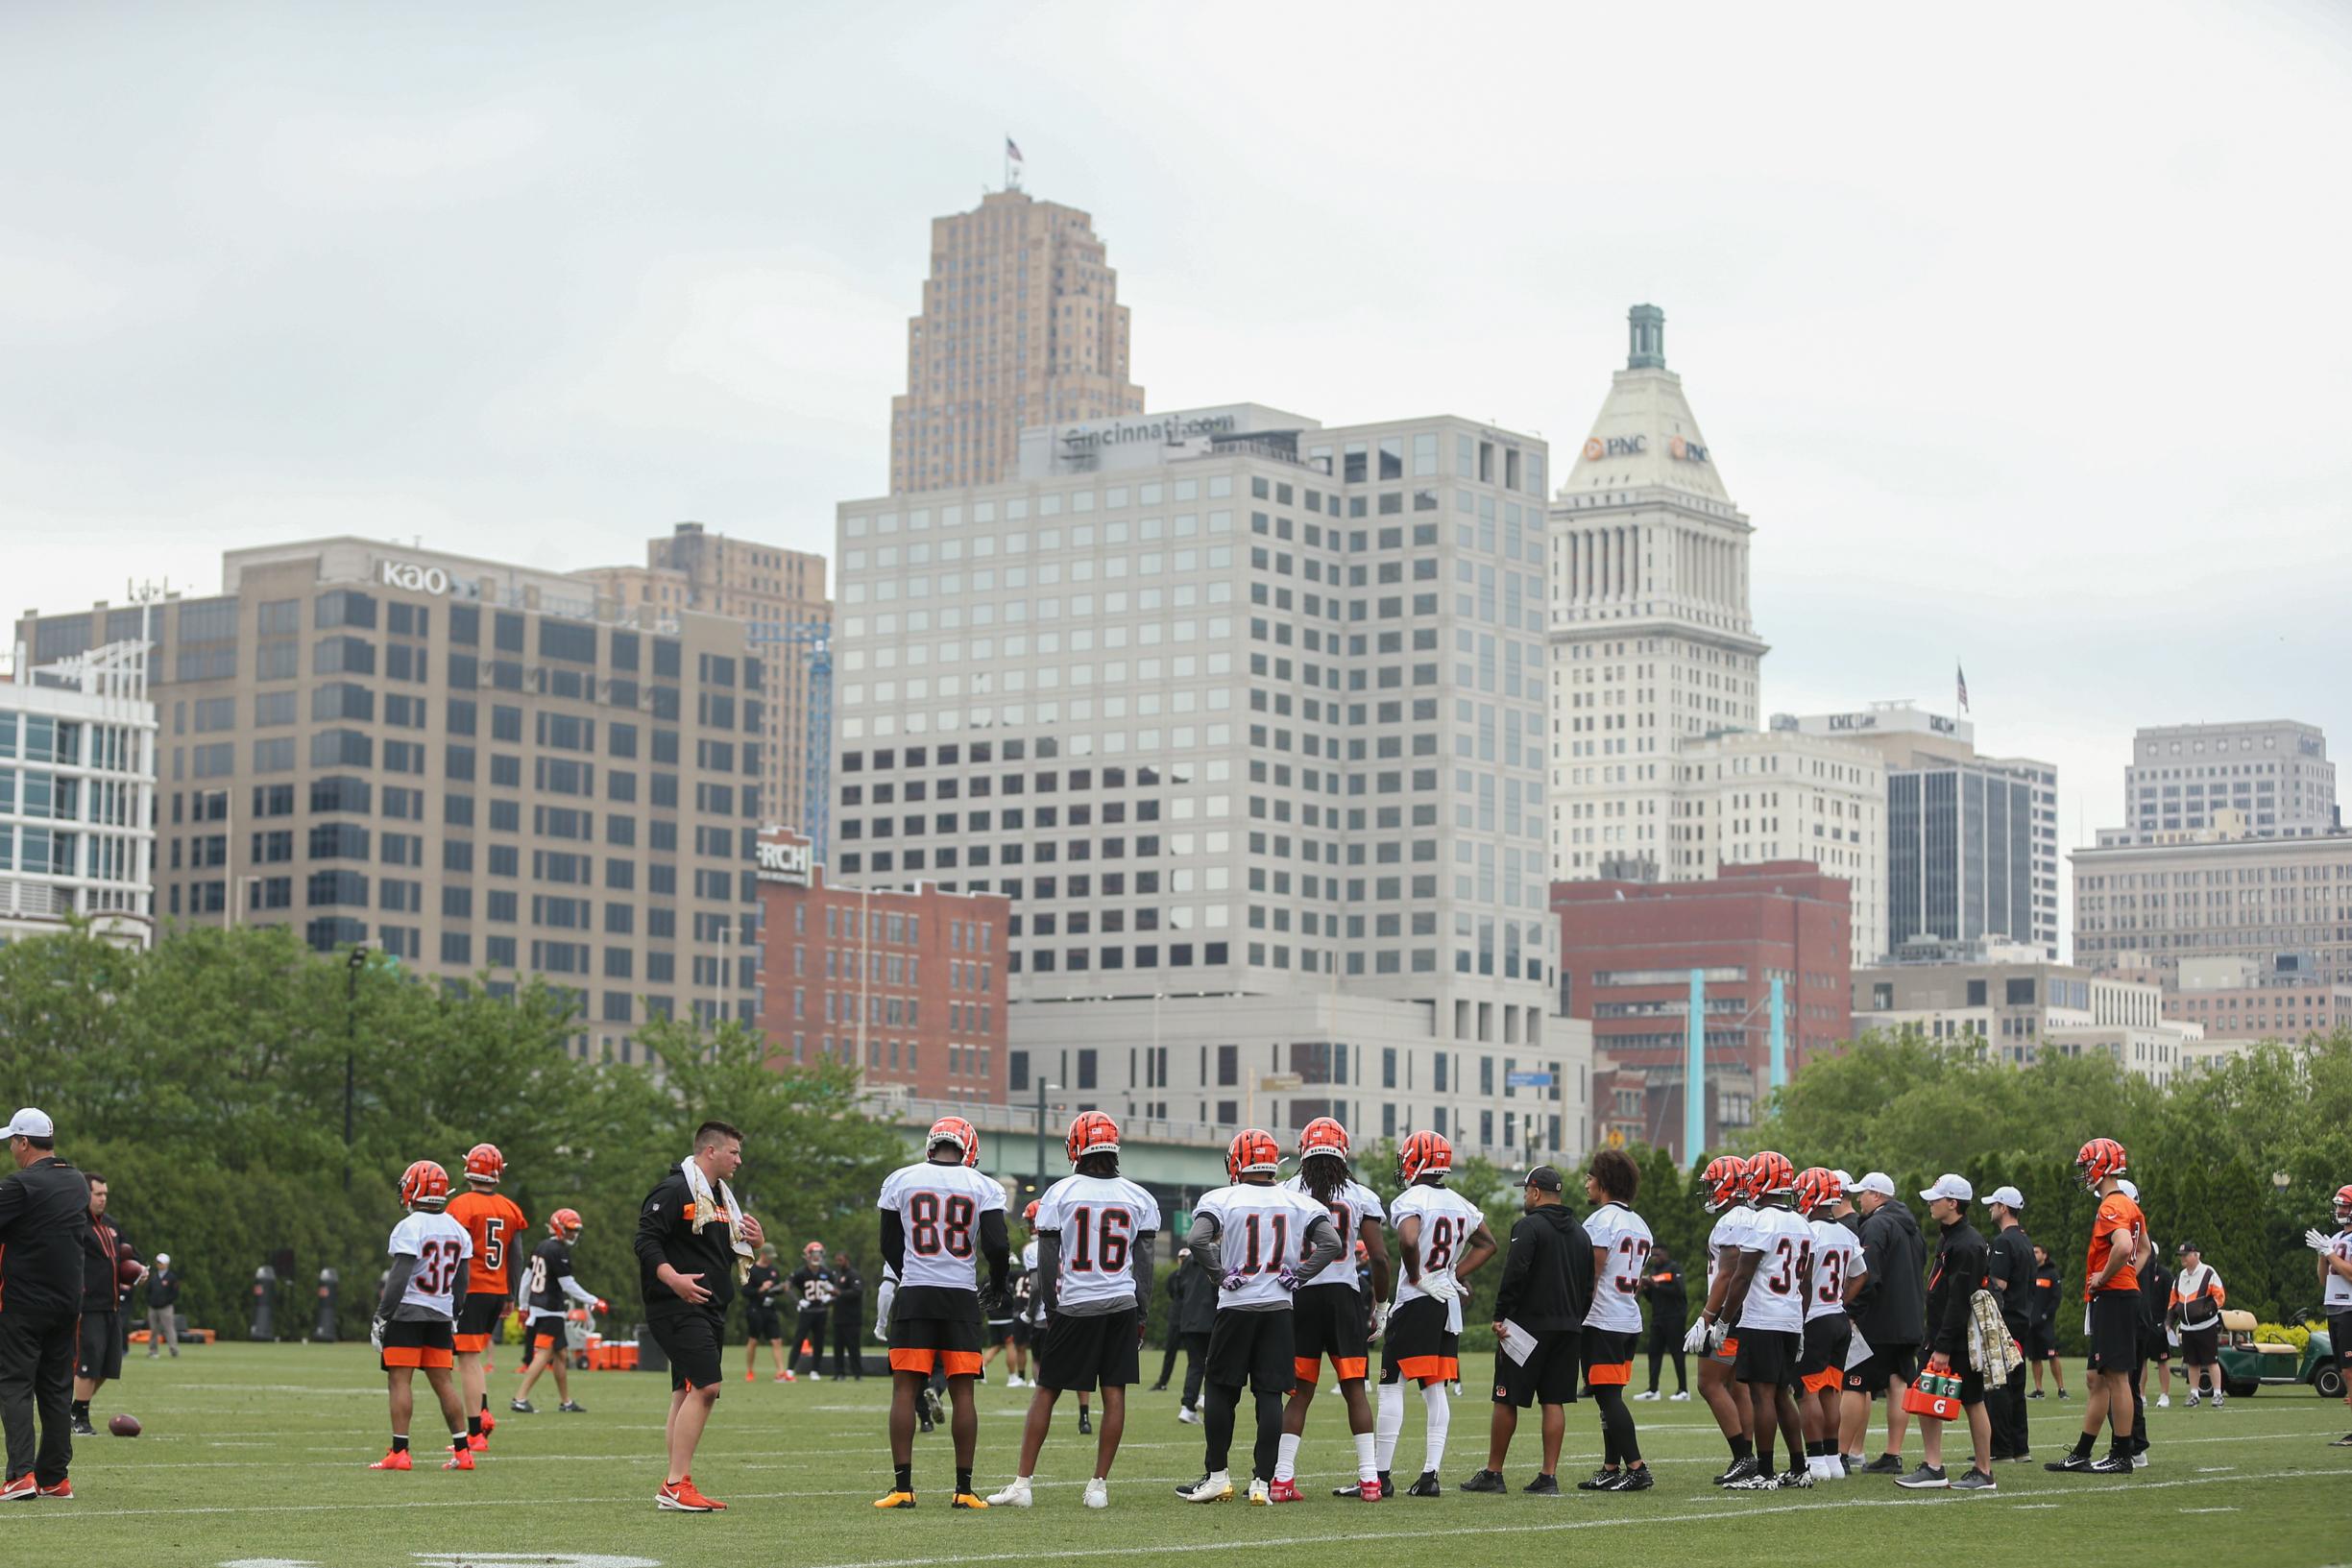 NFL: MAY 10 Bengals Rookie Mini-Camp